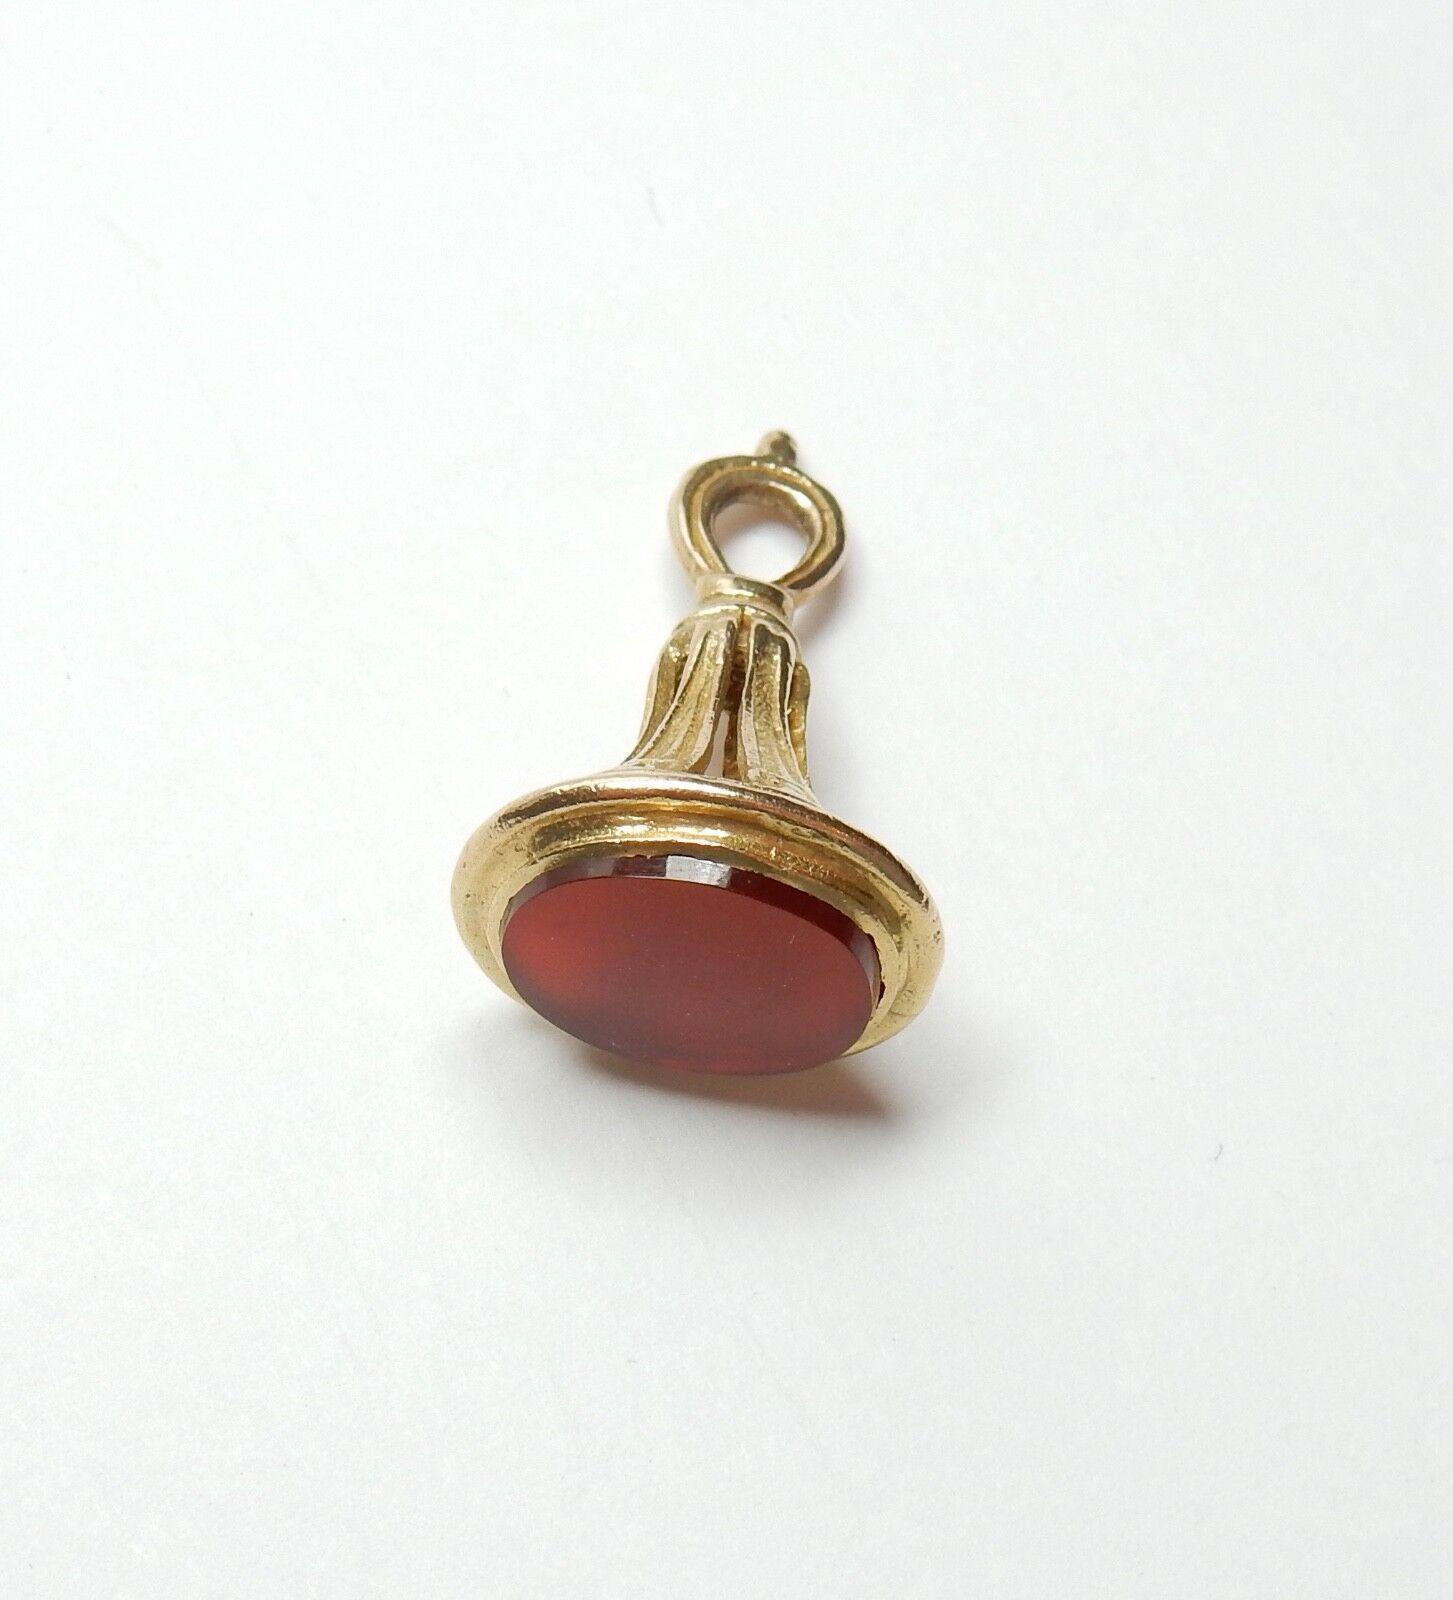 Fob cornelian  9 carat gold vintage charm fob  London 1972